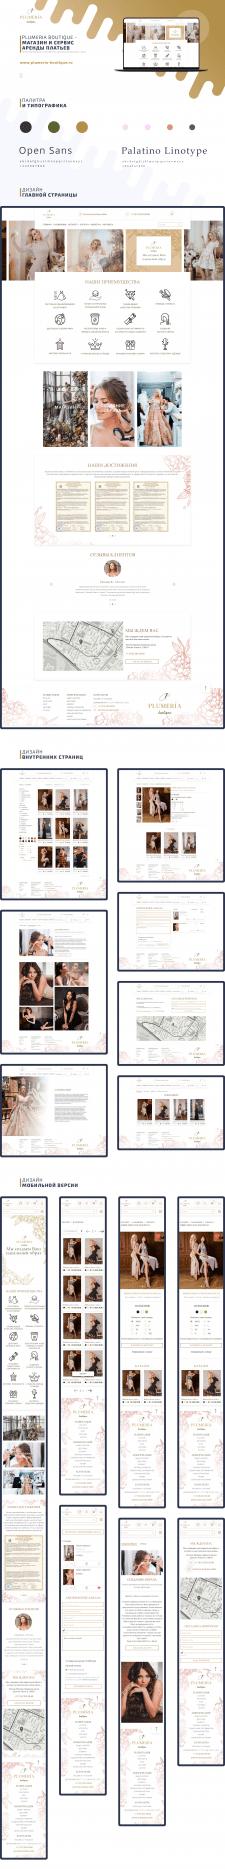 Plumeria boutique  |  Интернет-магазин